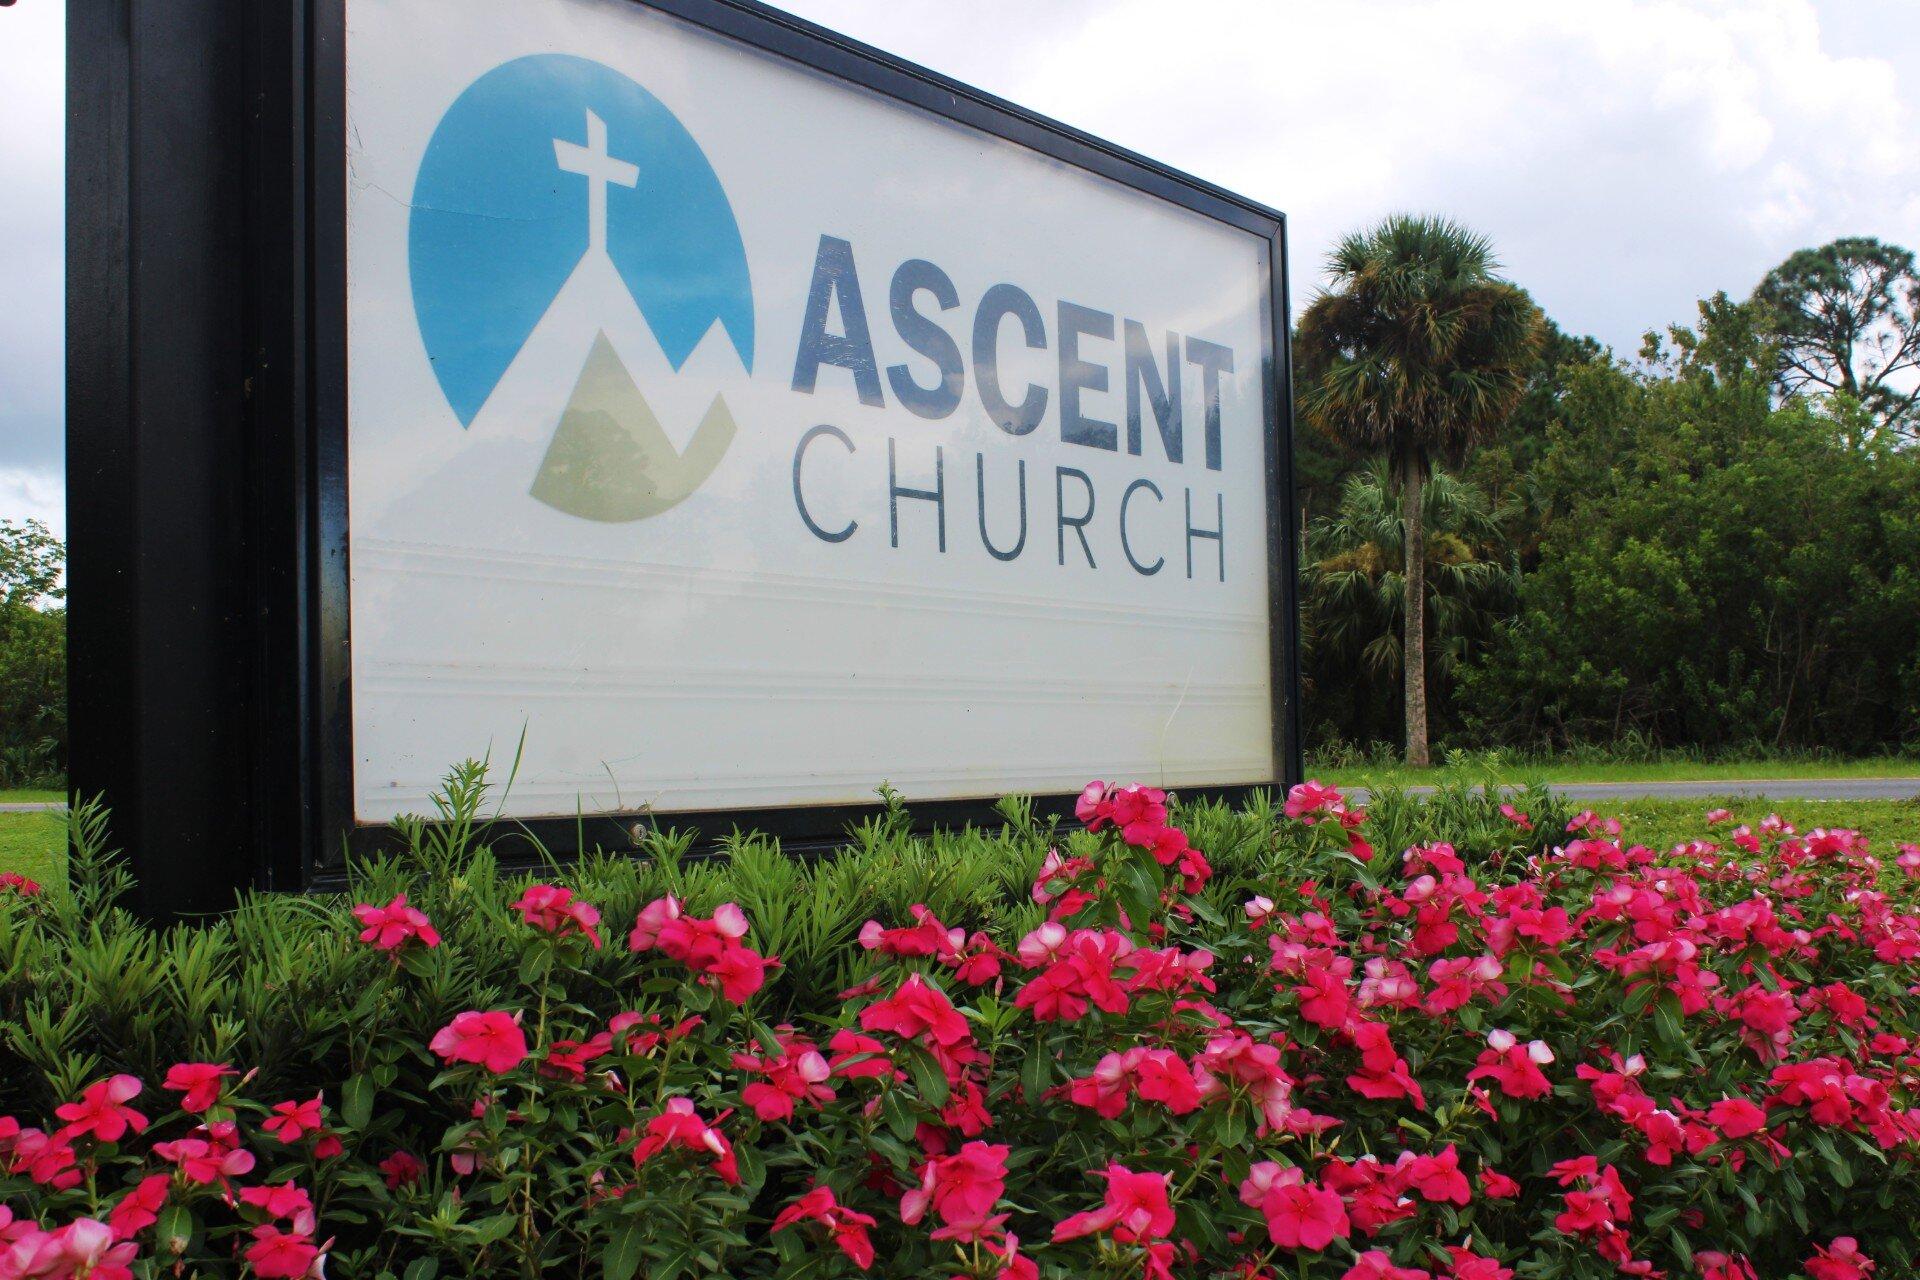 Ascent Church_9-15-19_6 (non blurred).jpg